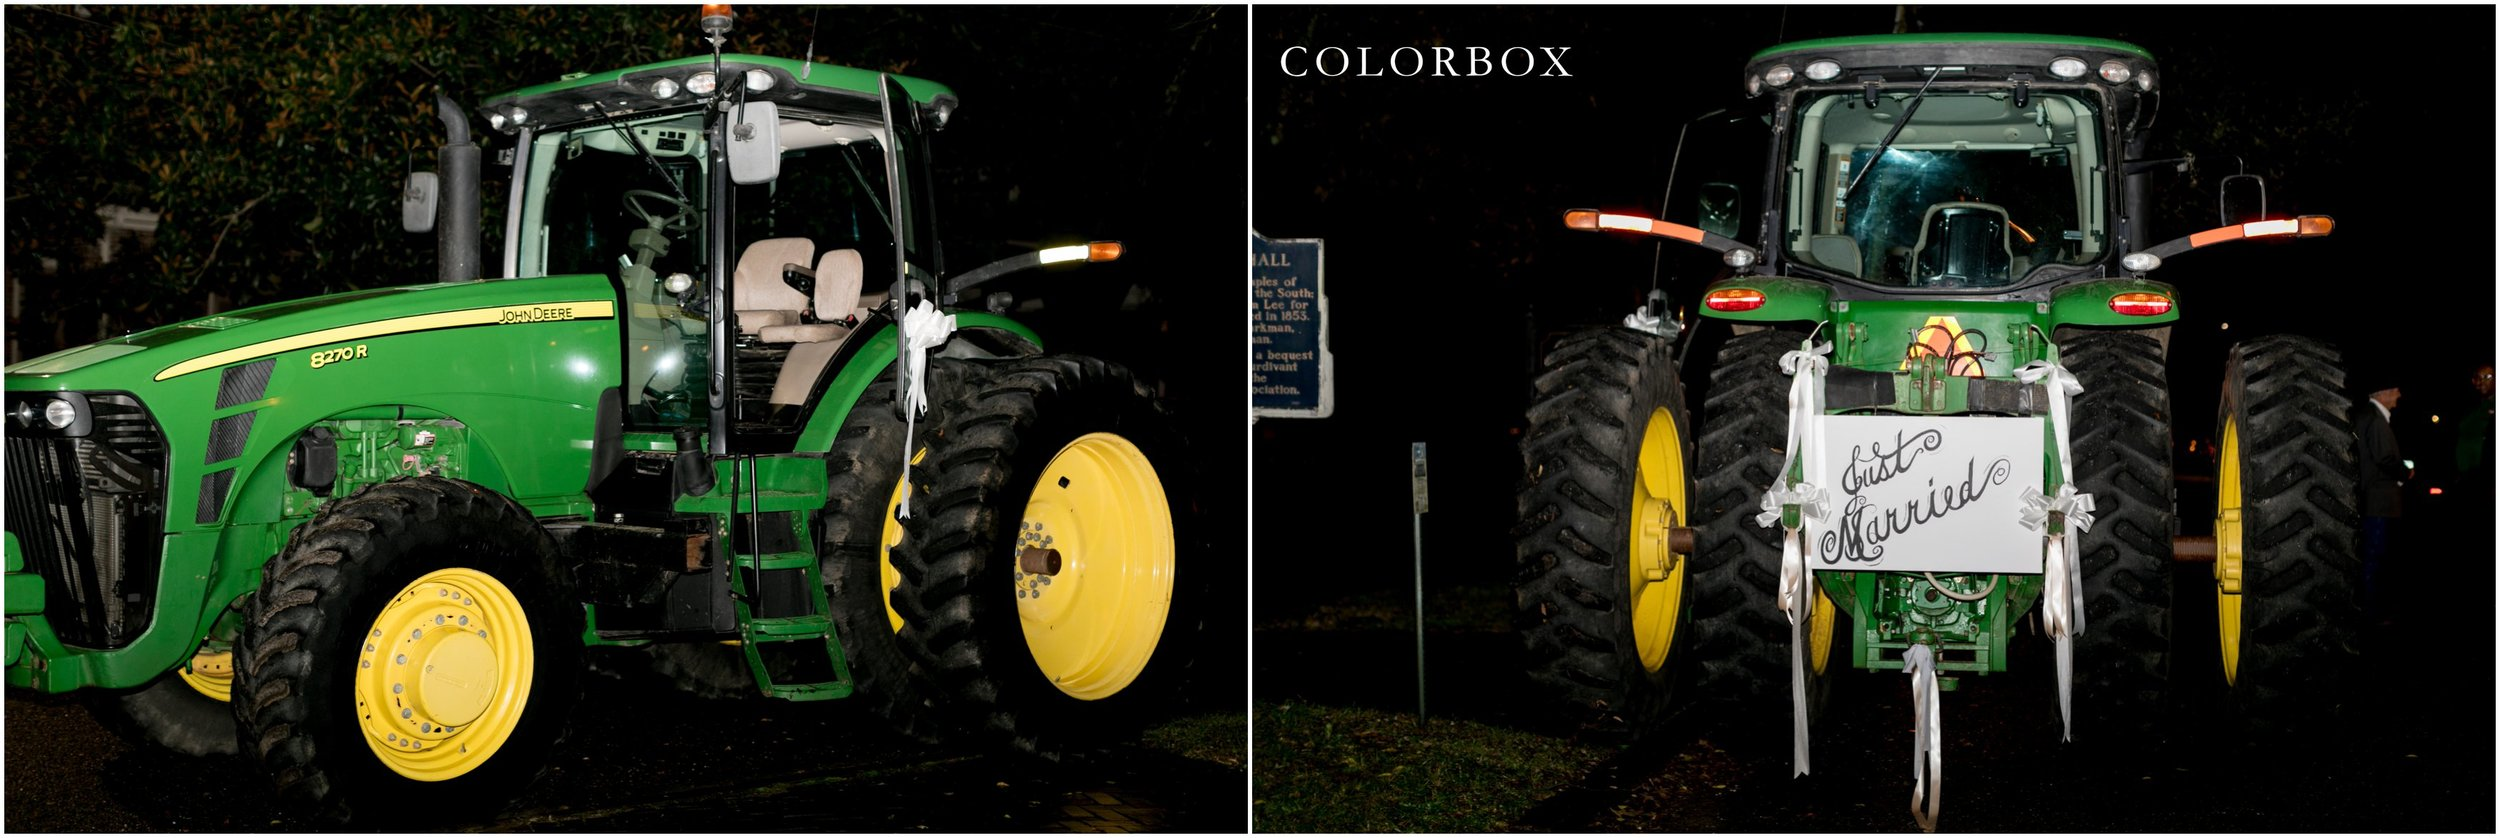 colorboxphotographers_6517.jpg